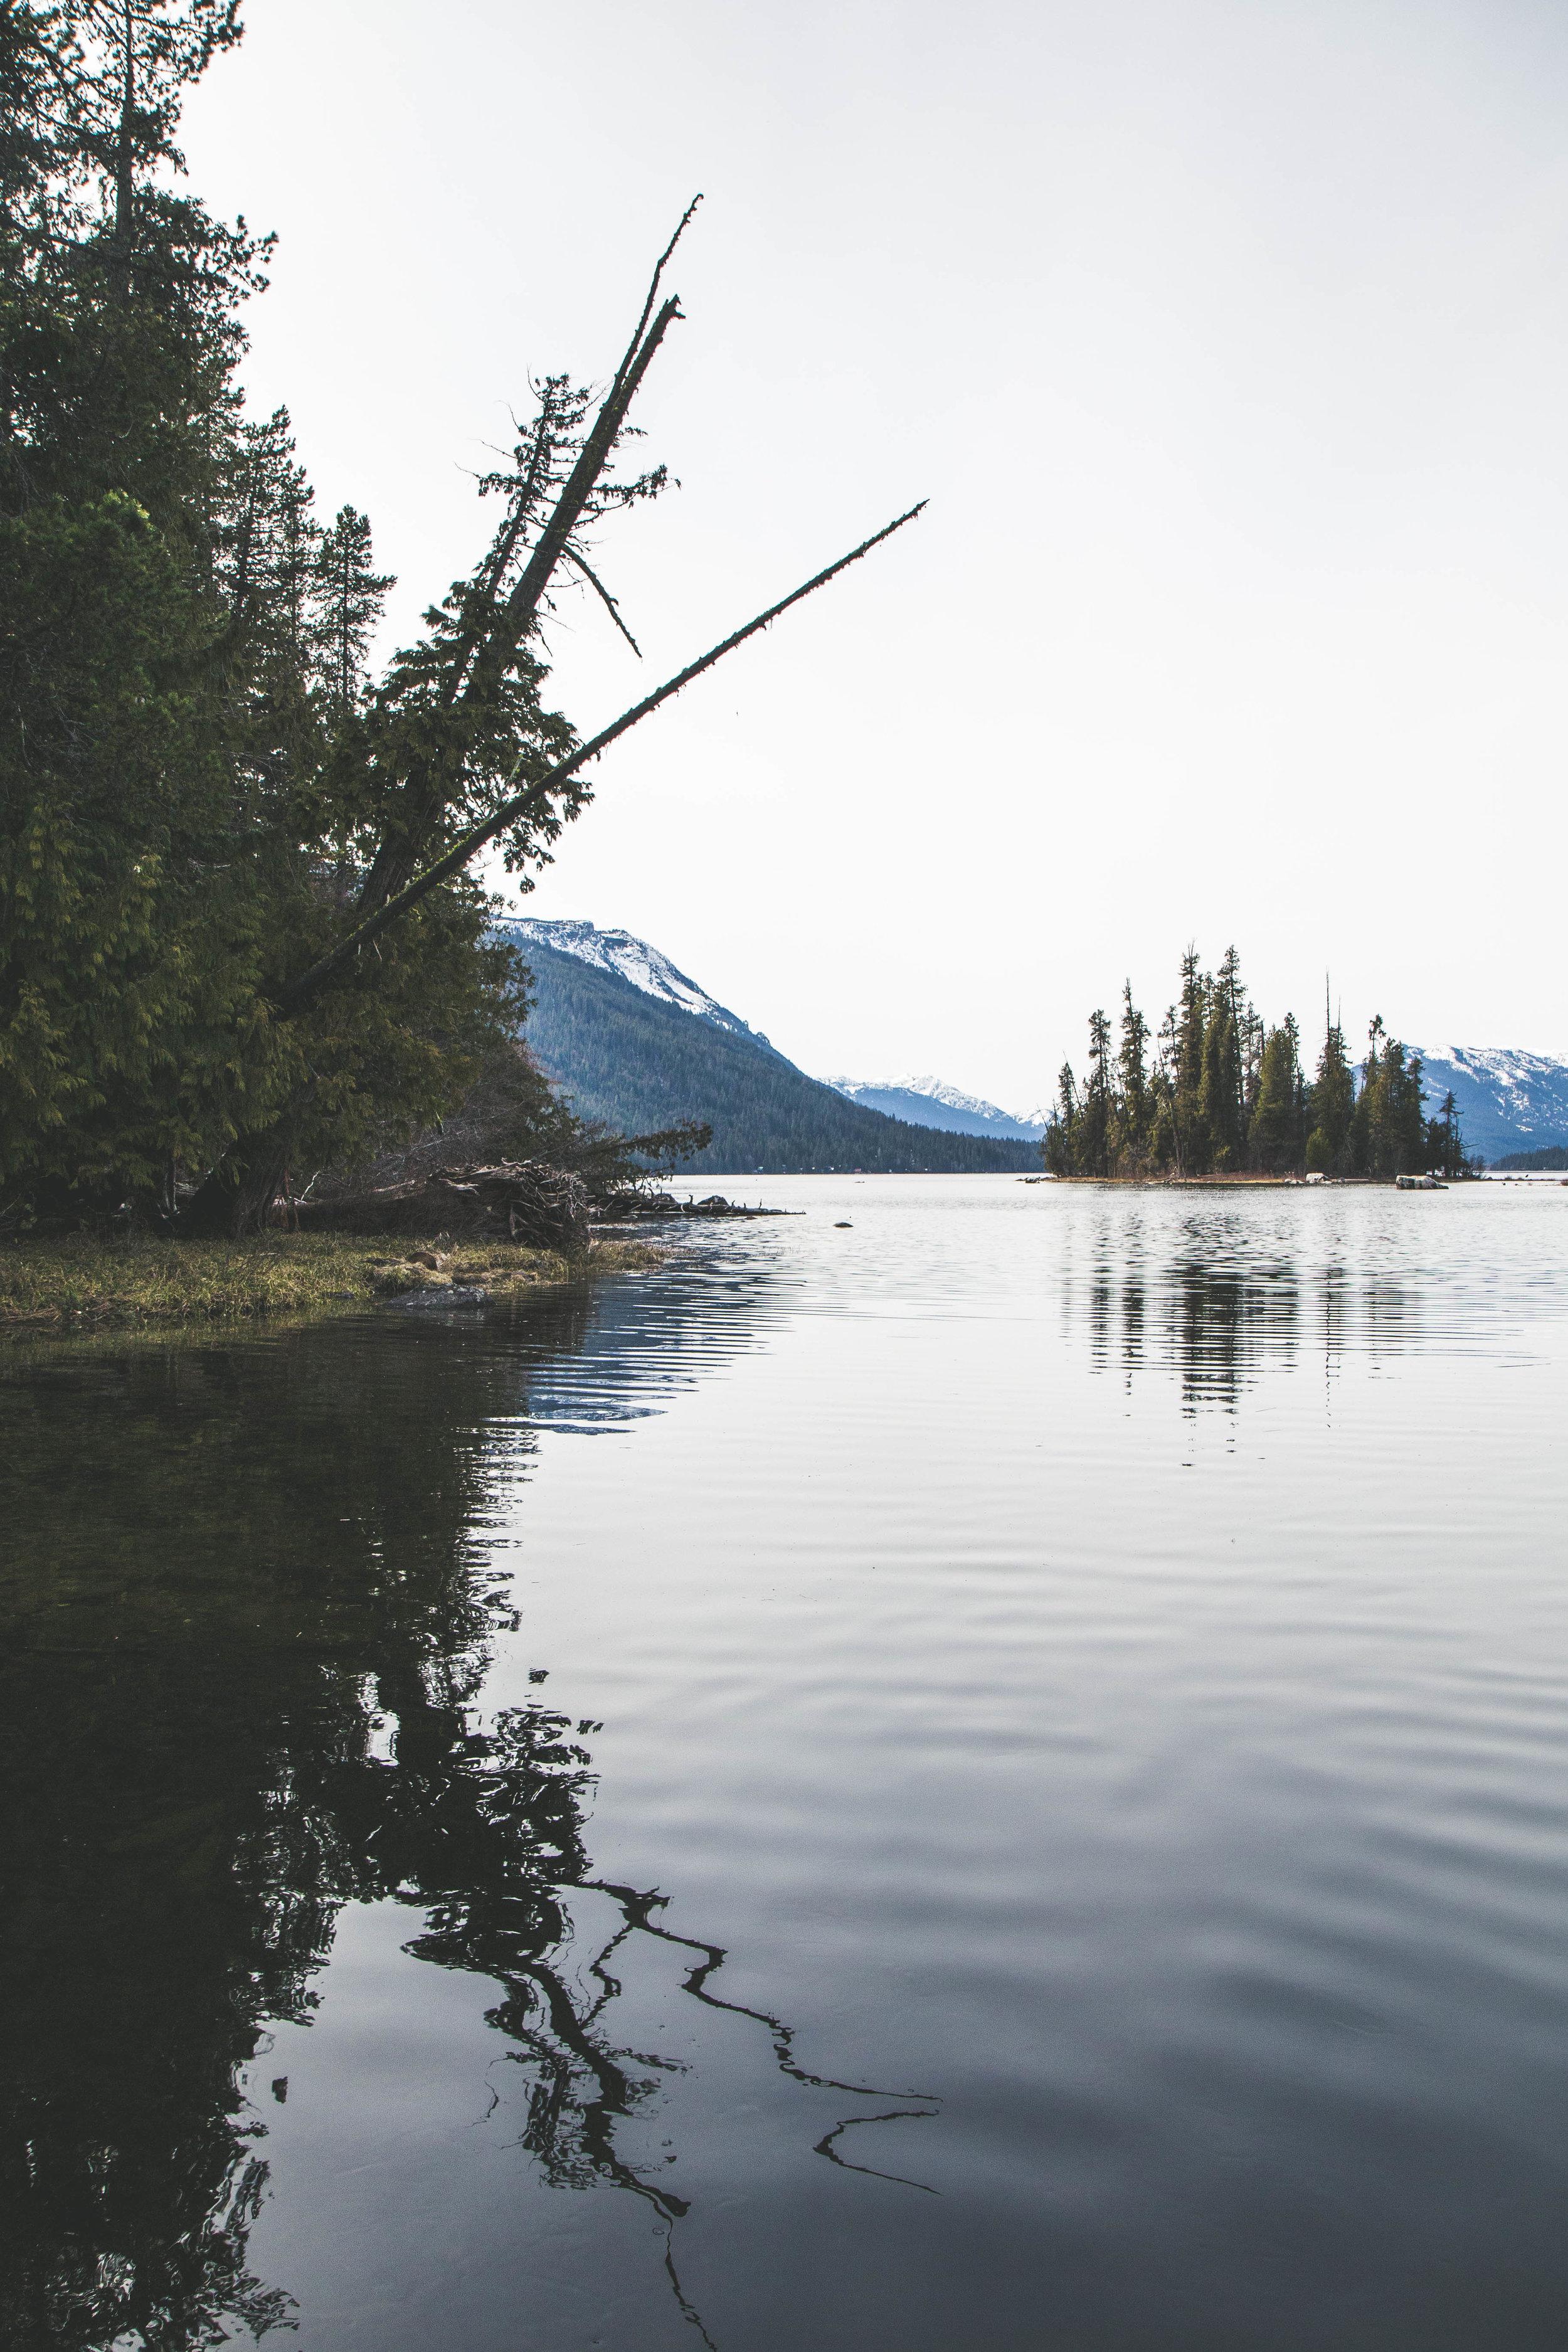 Lake Wentachee outside of Leavenworth, Washington. A gorgeous lake that has many beaches and hiking trails.